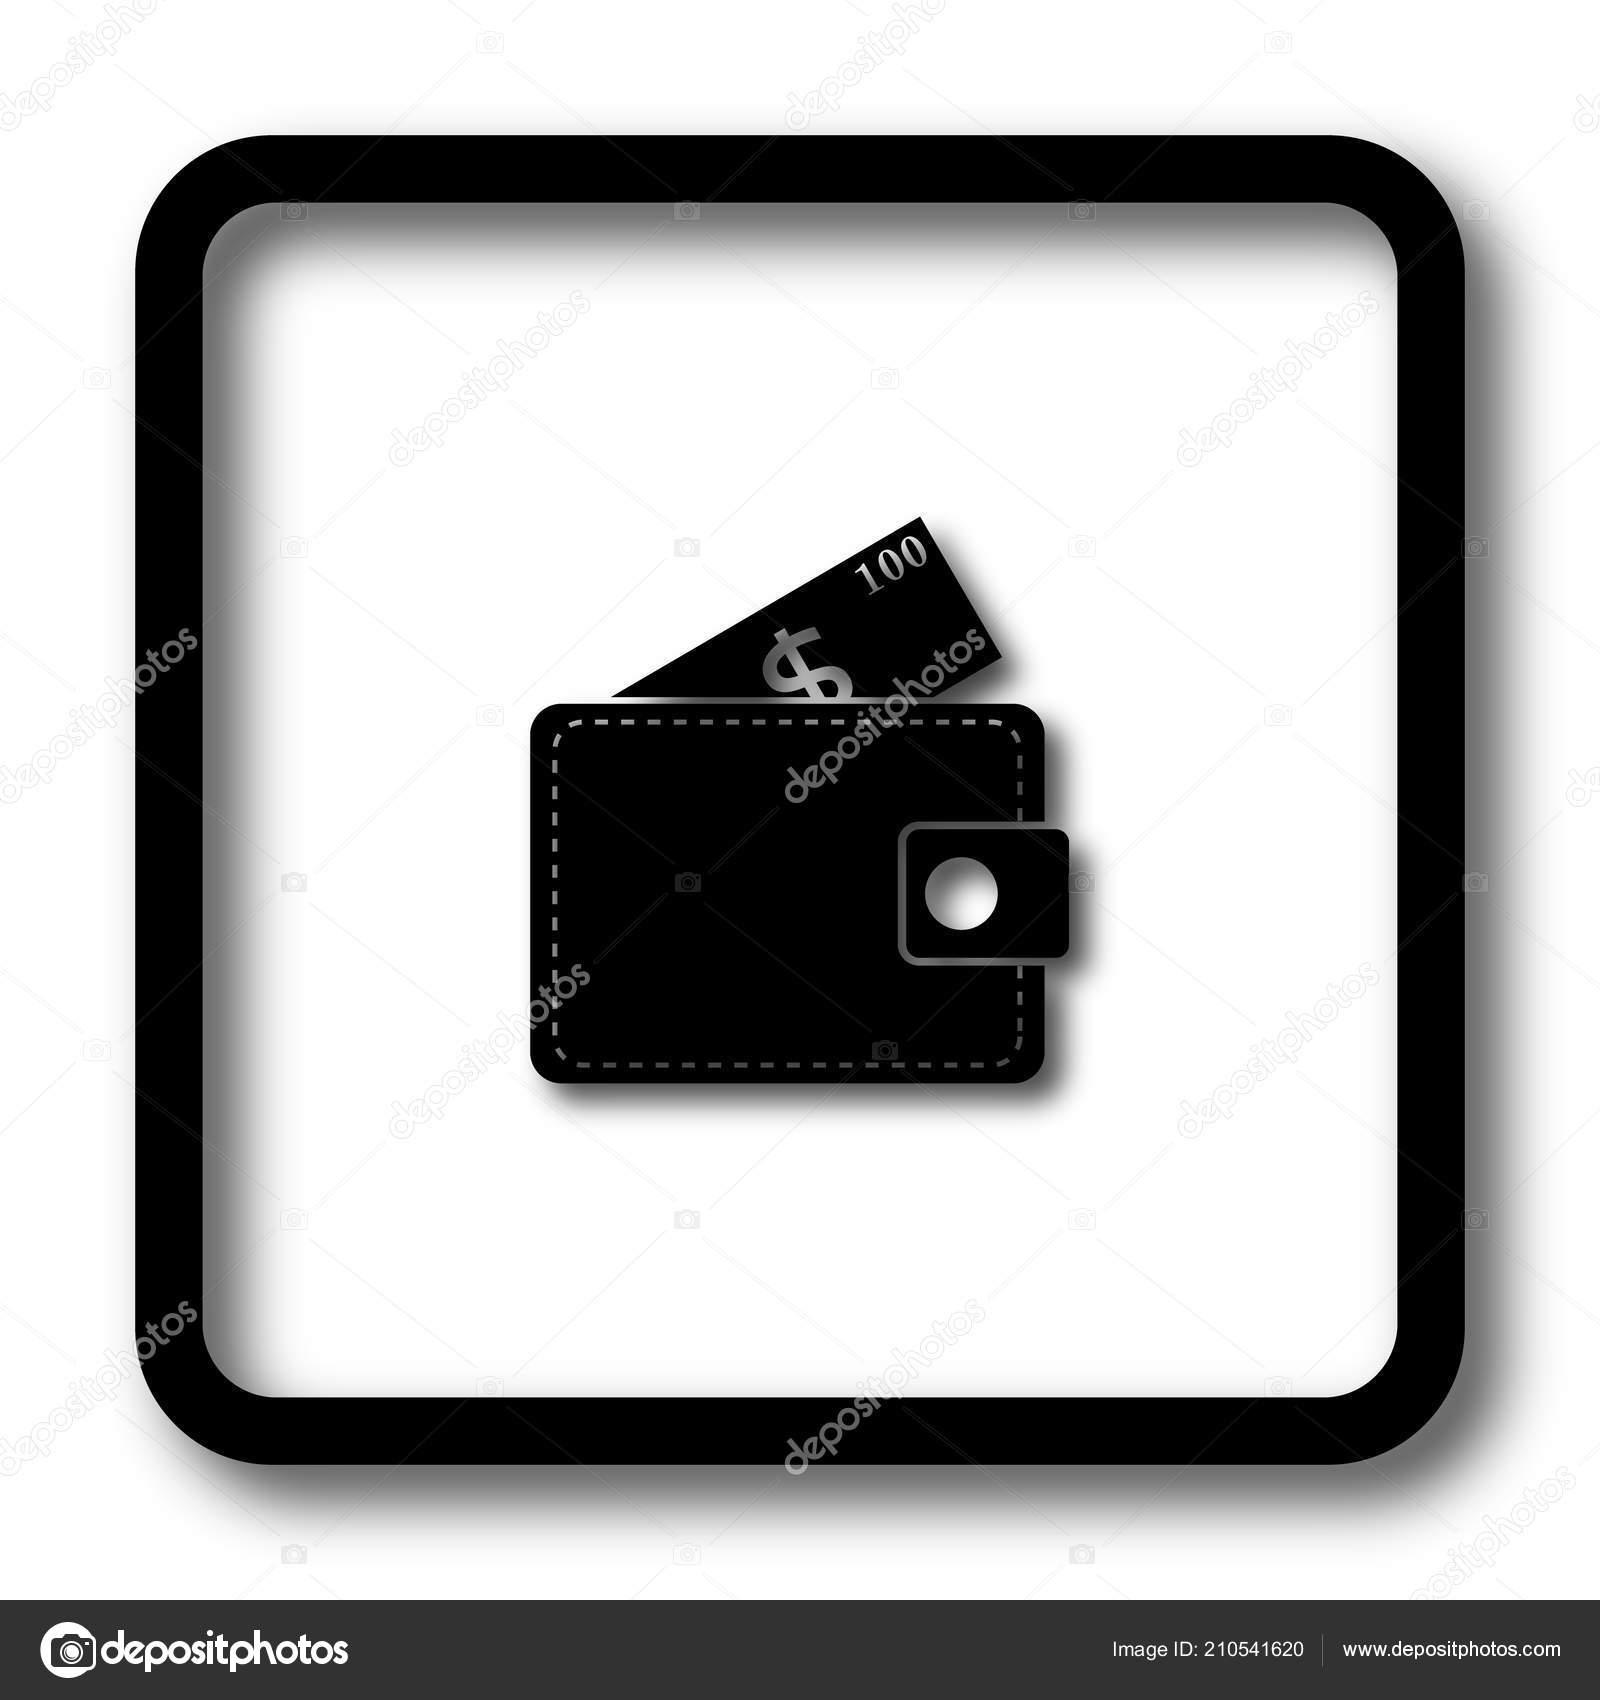 wallet icon black website button white background stock photo c valentint 210541620 depositphotos